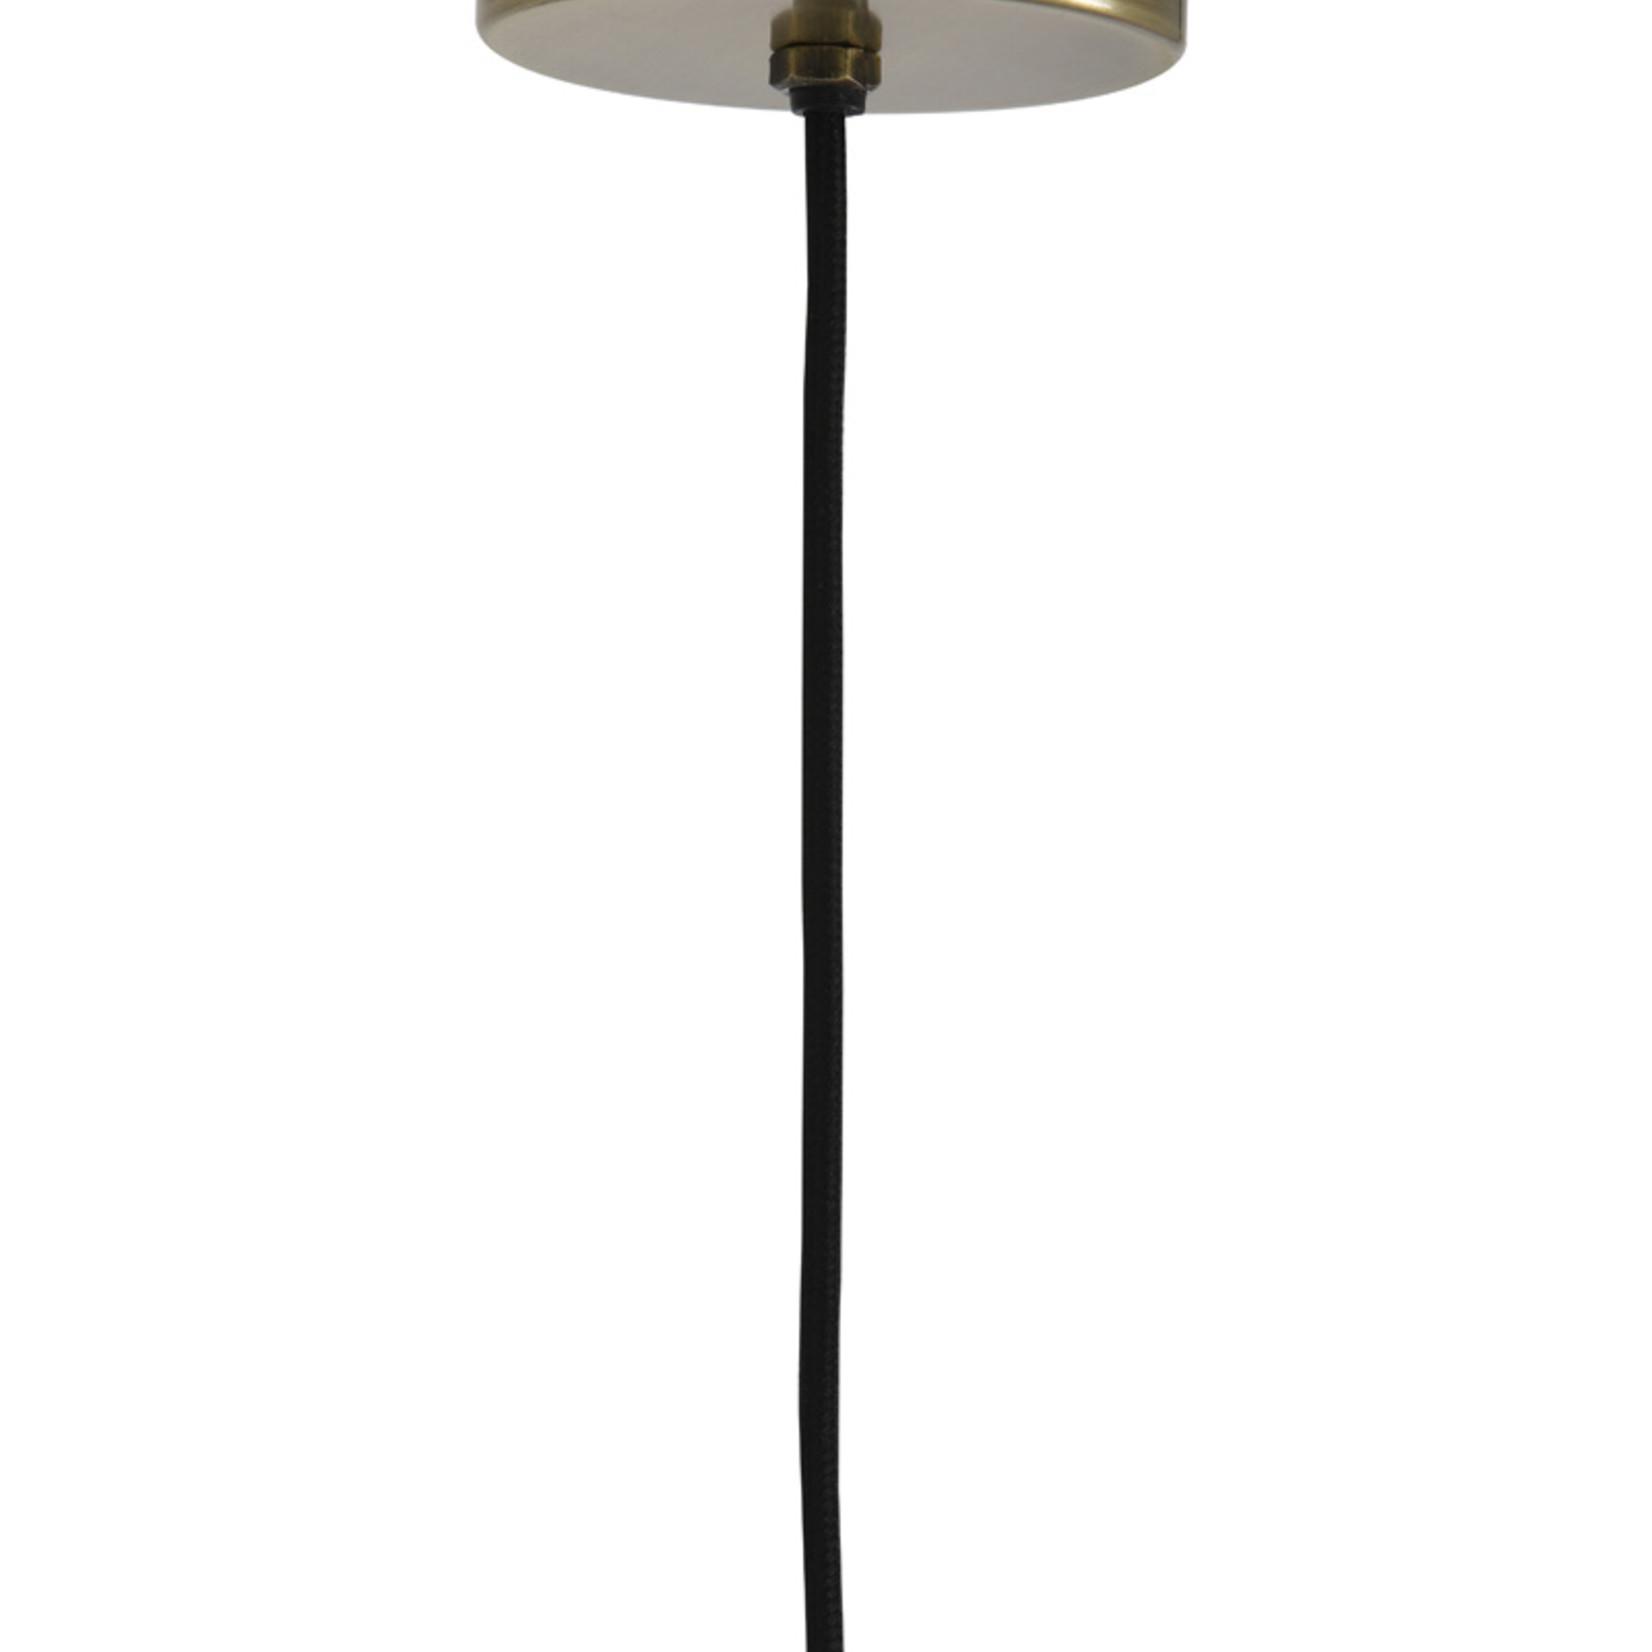 Hanglamp - ROHUT  -  donker warm grijs